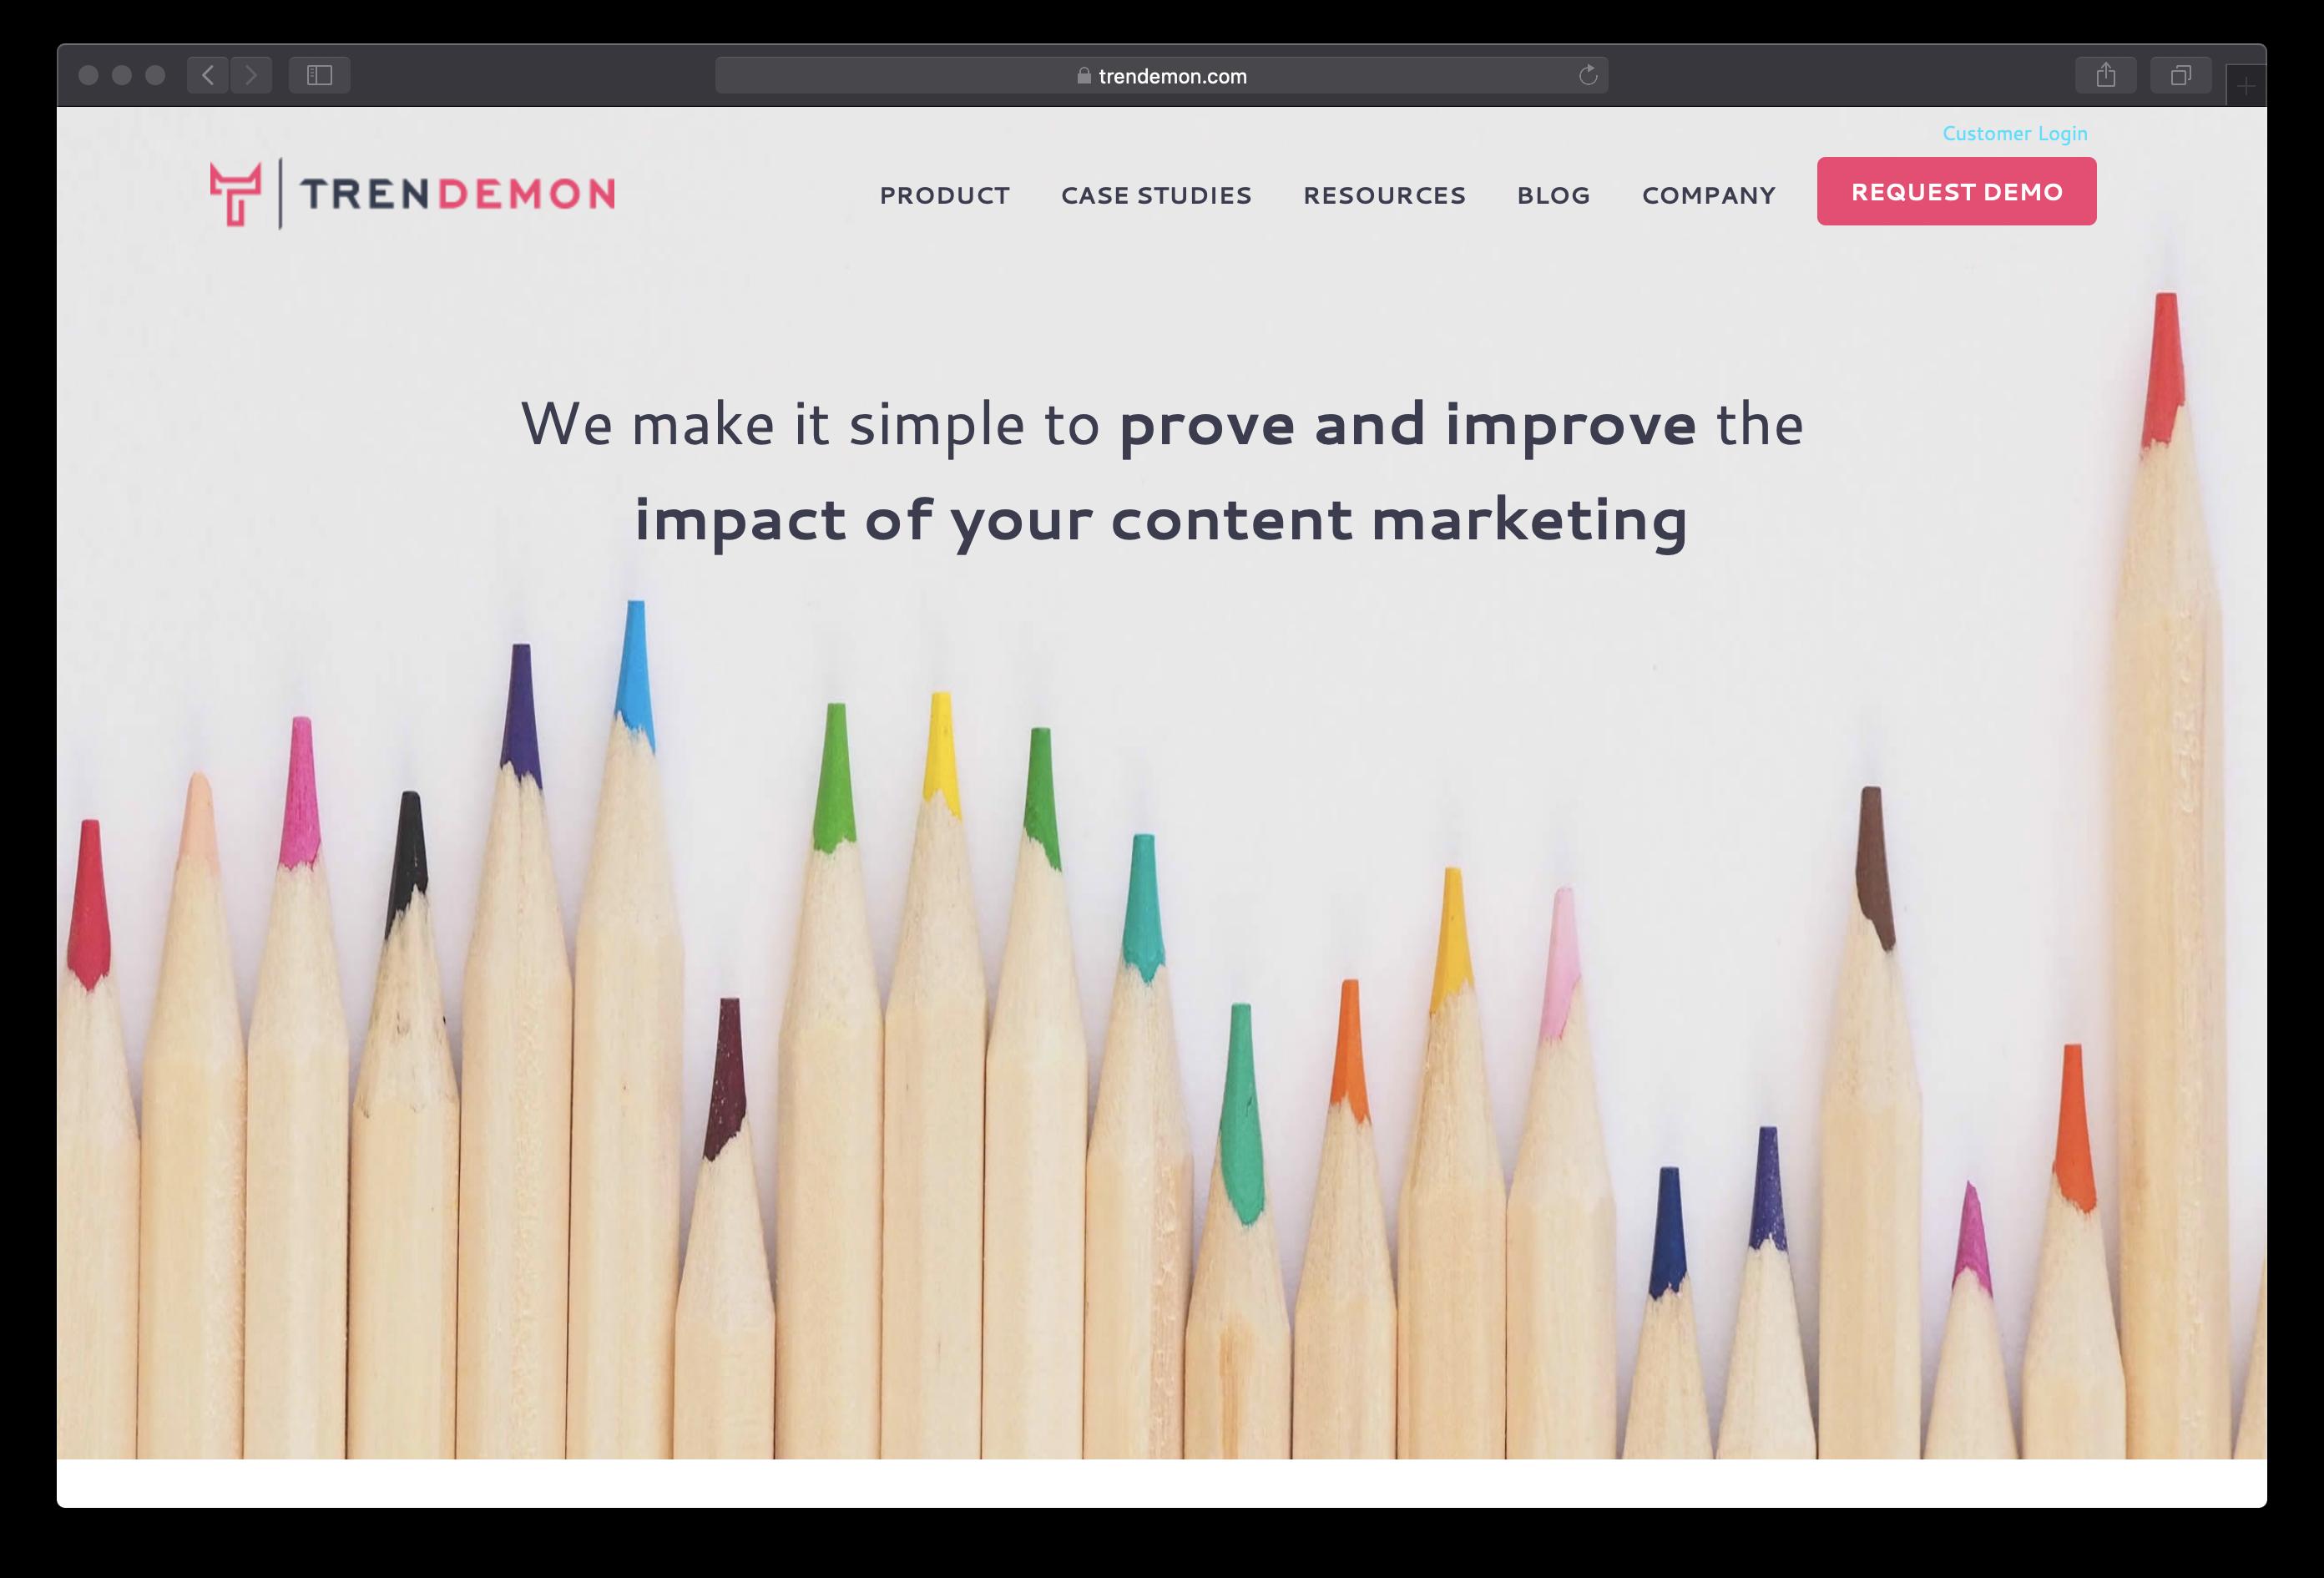 integraciones-marketing-hubspot-trendemon